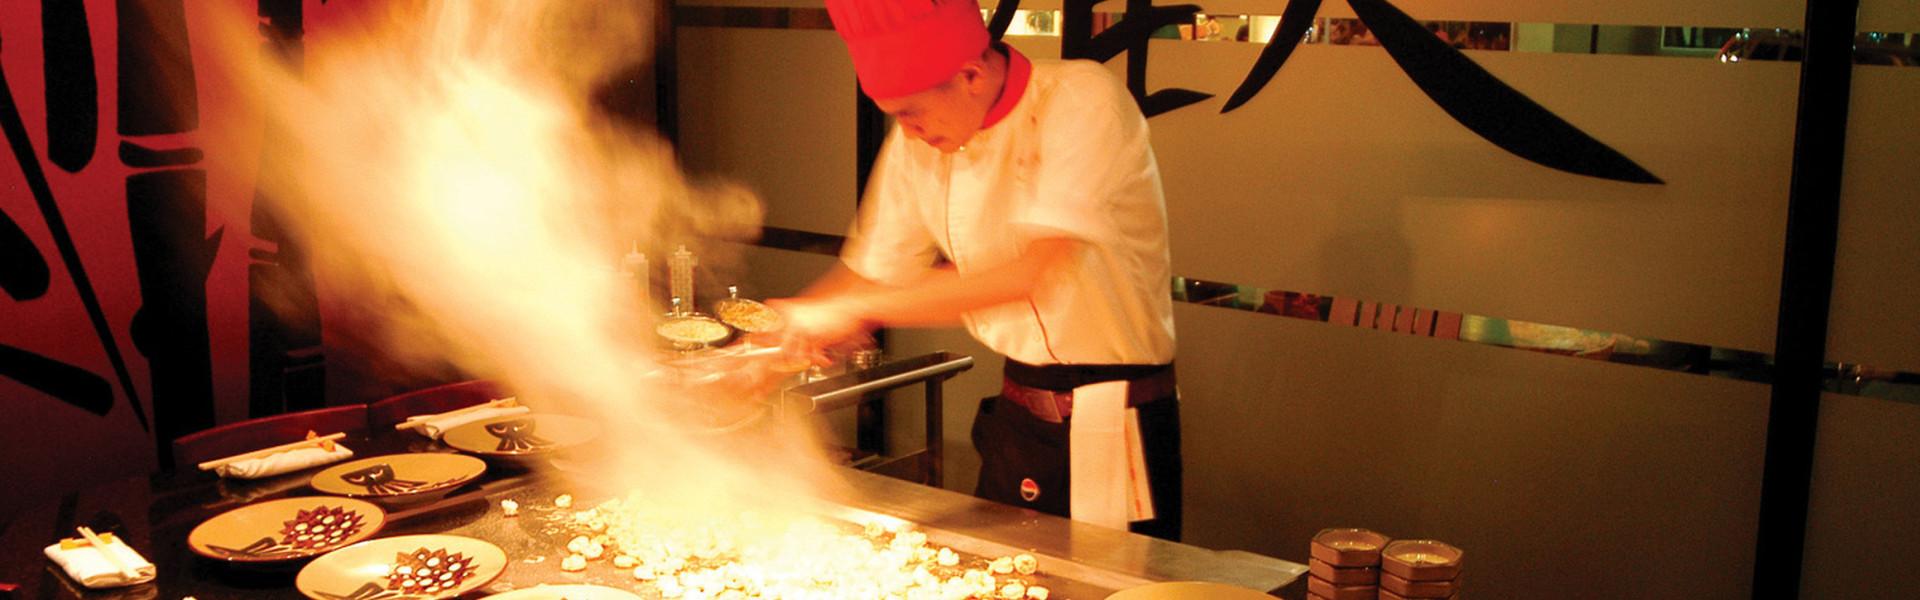 Elegant and Affordable Dining Options in Las Vegas NV | Westgate Las Vegas Resort & Casino